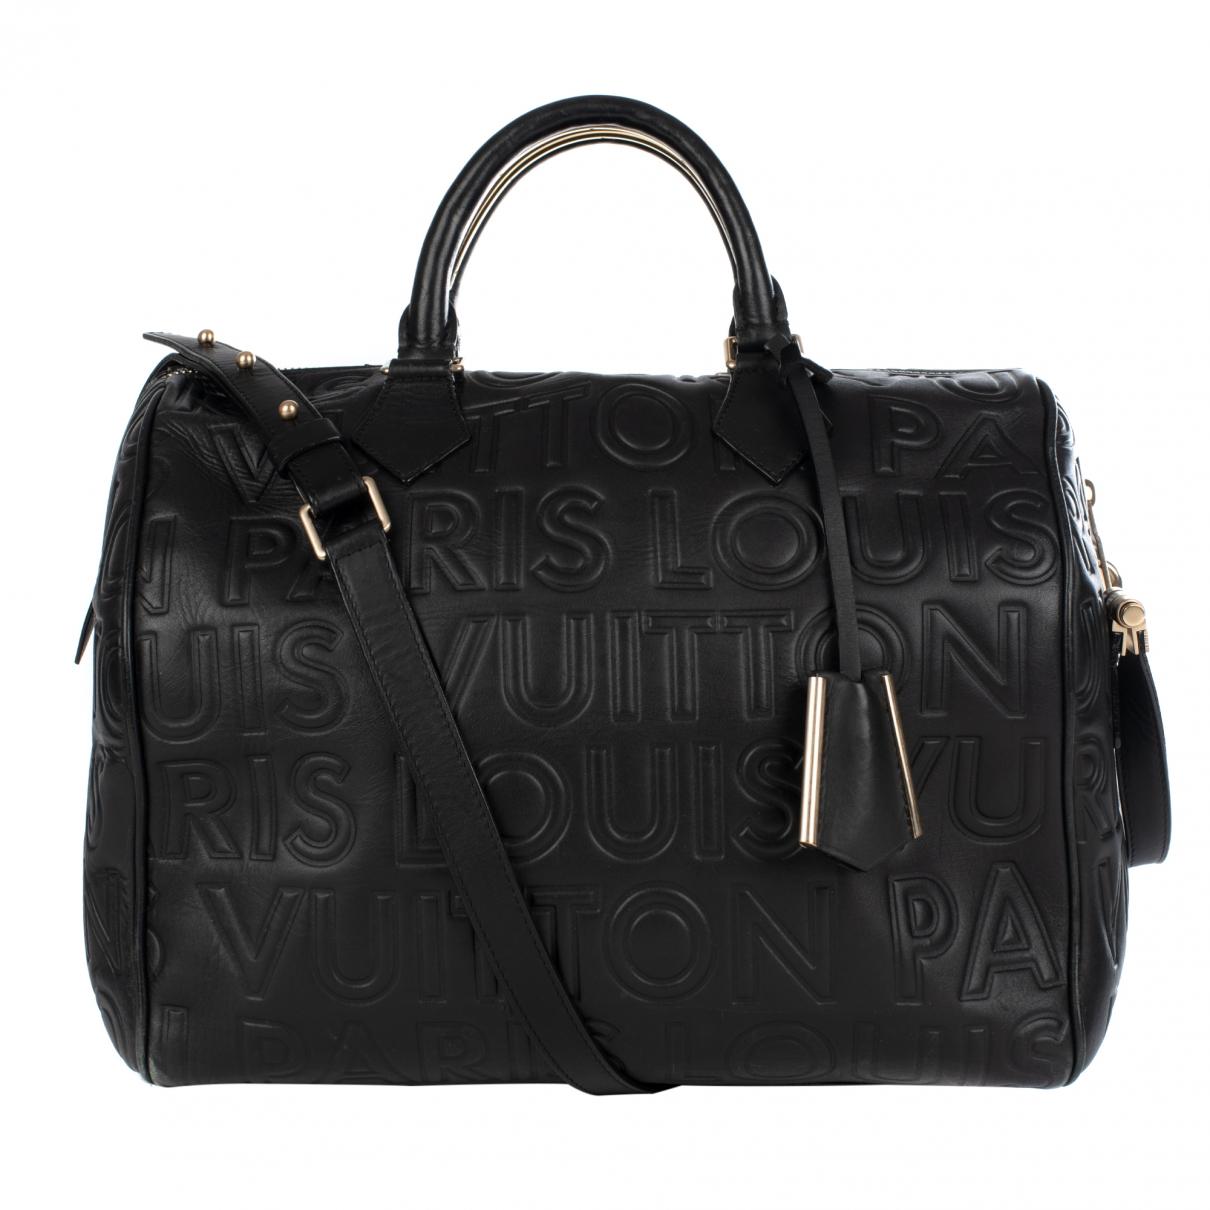 Louis Vuitton - Sac a main Speedy pour femme en cuir - noir